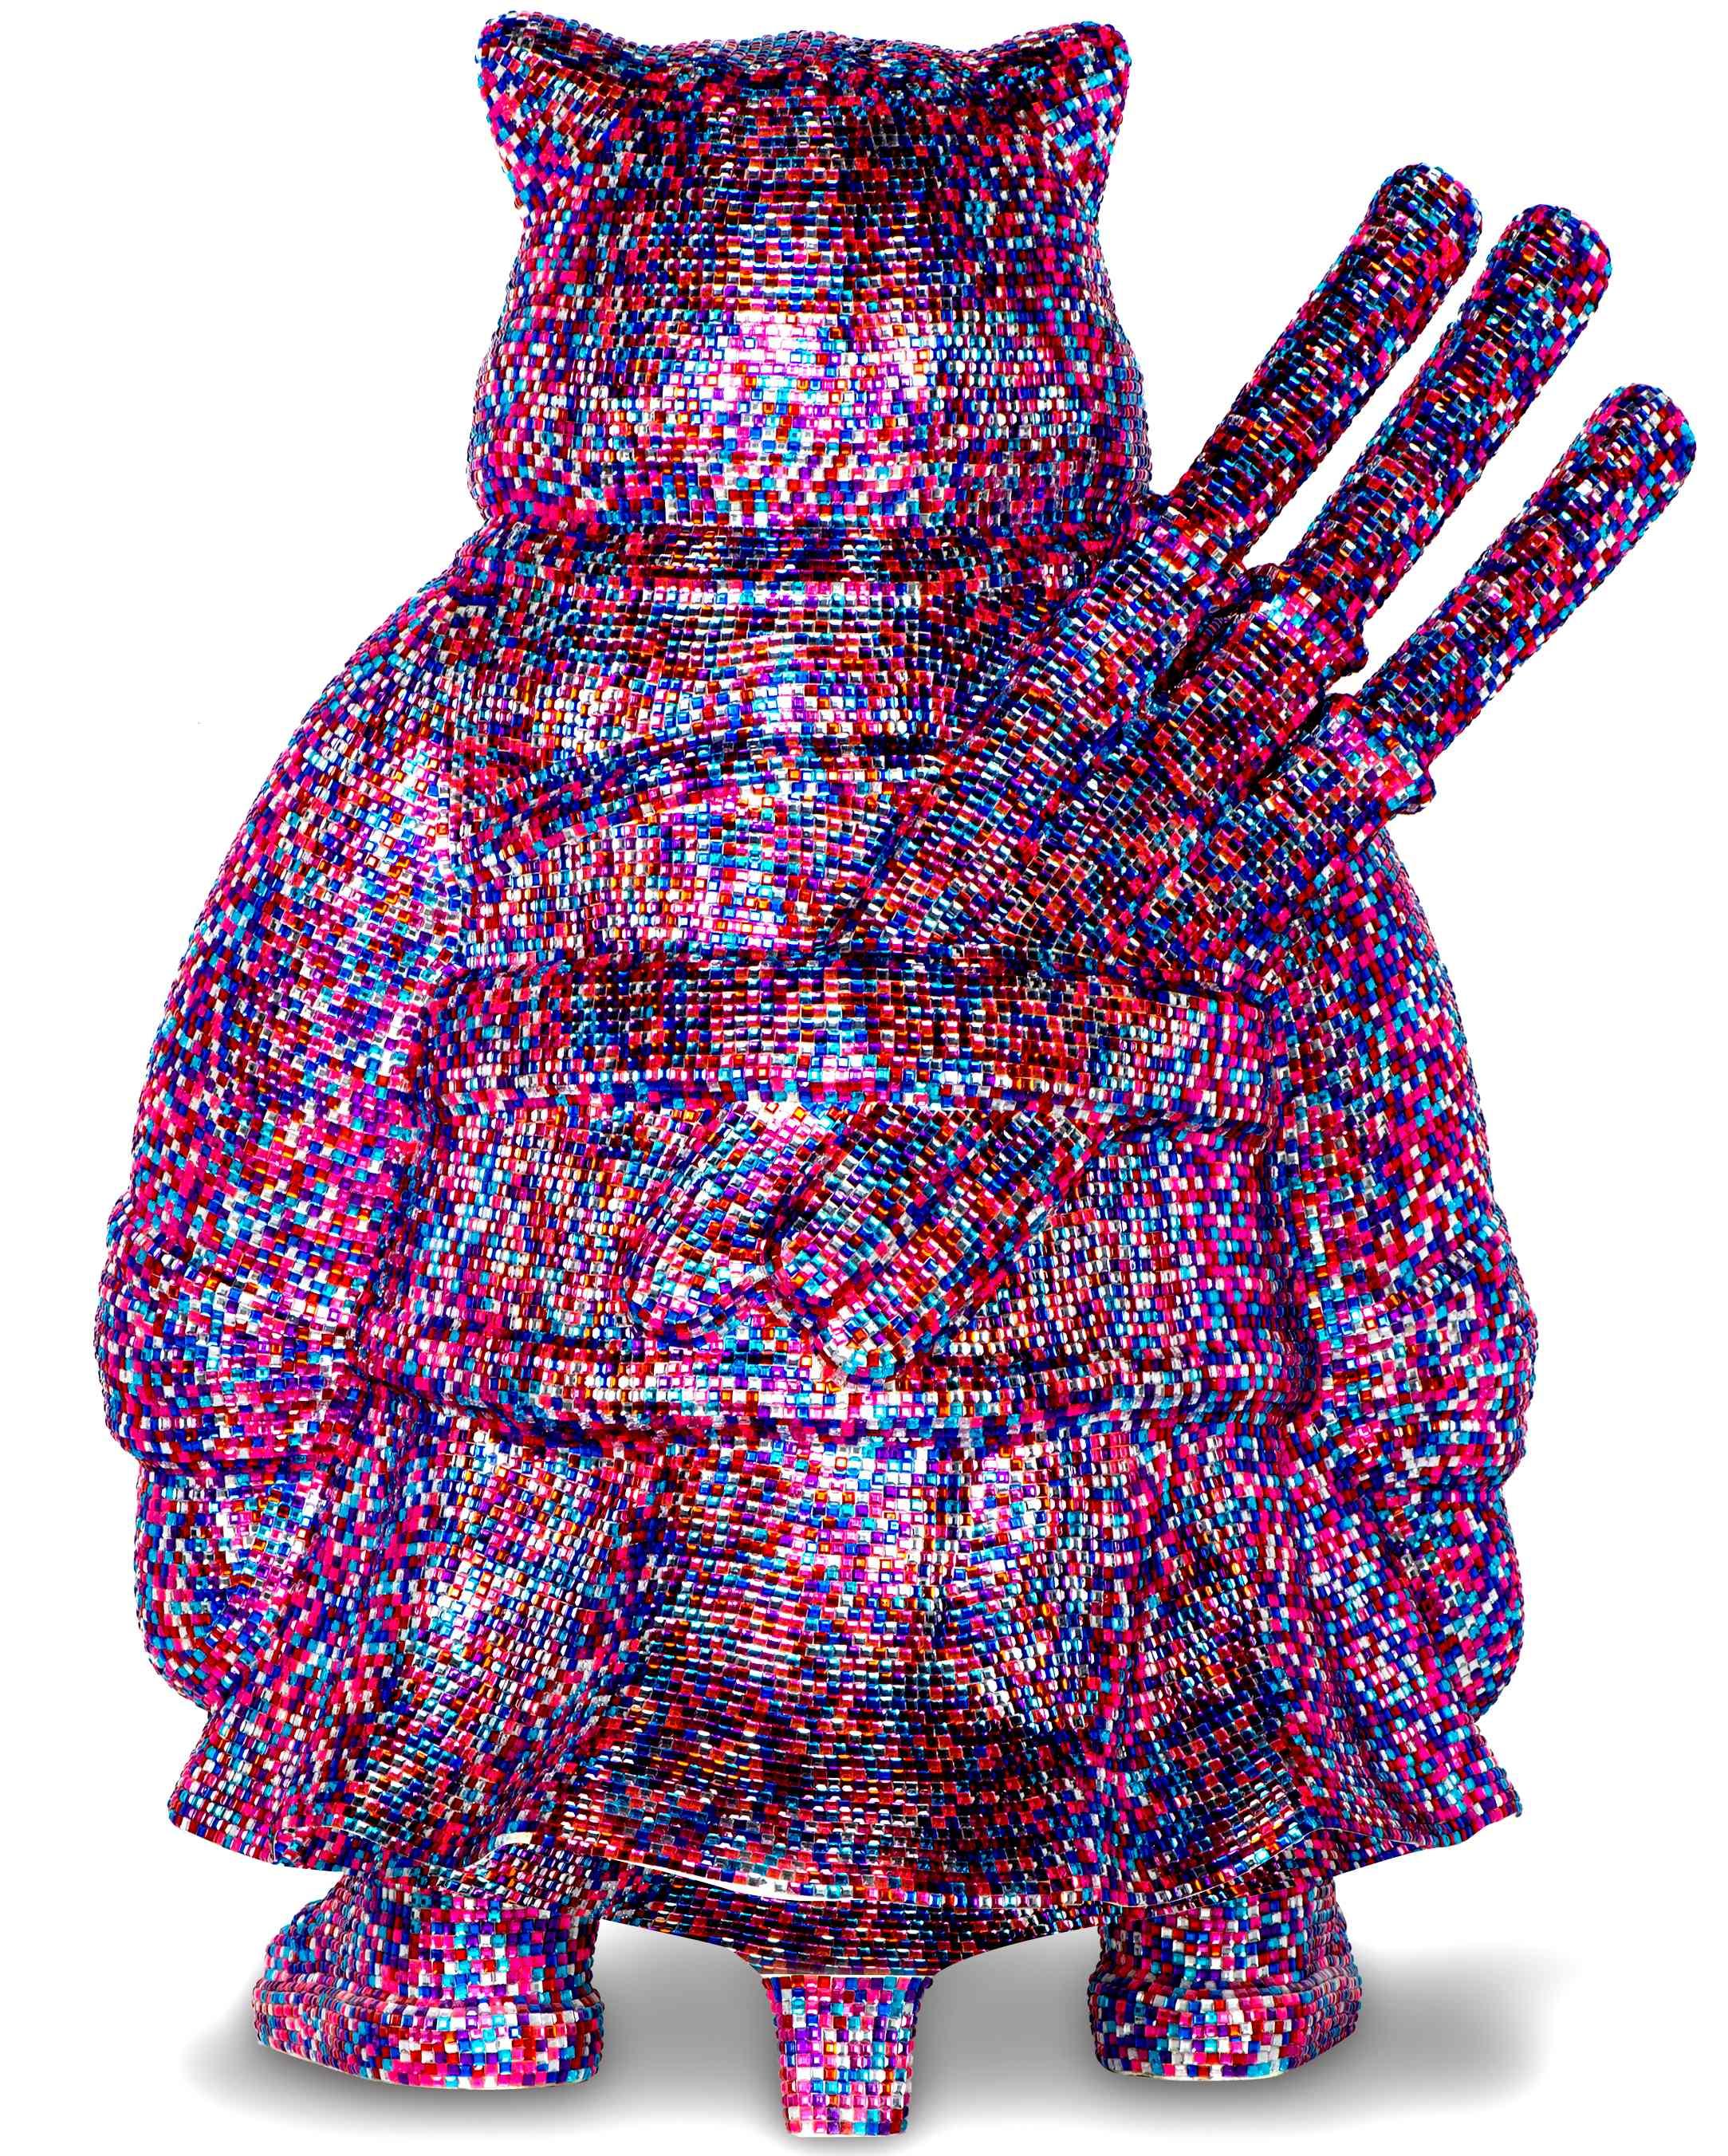 SAMURAI DIAMONDS STRASS PINK